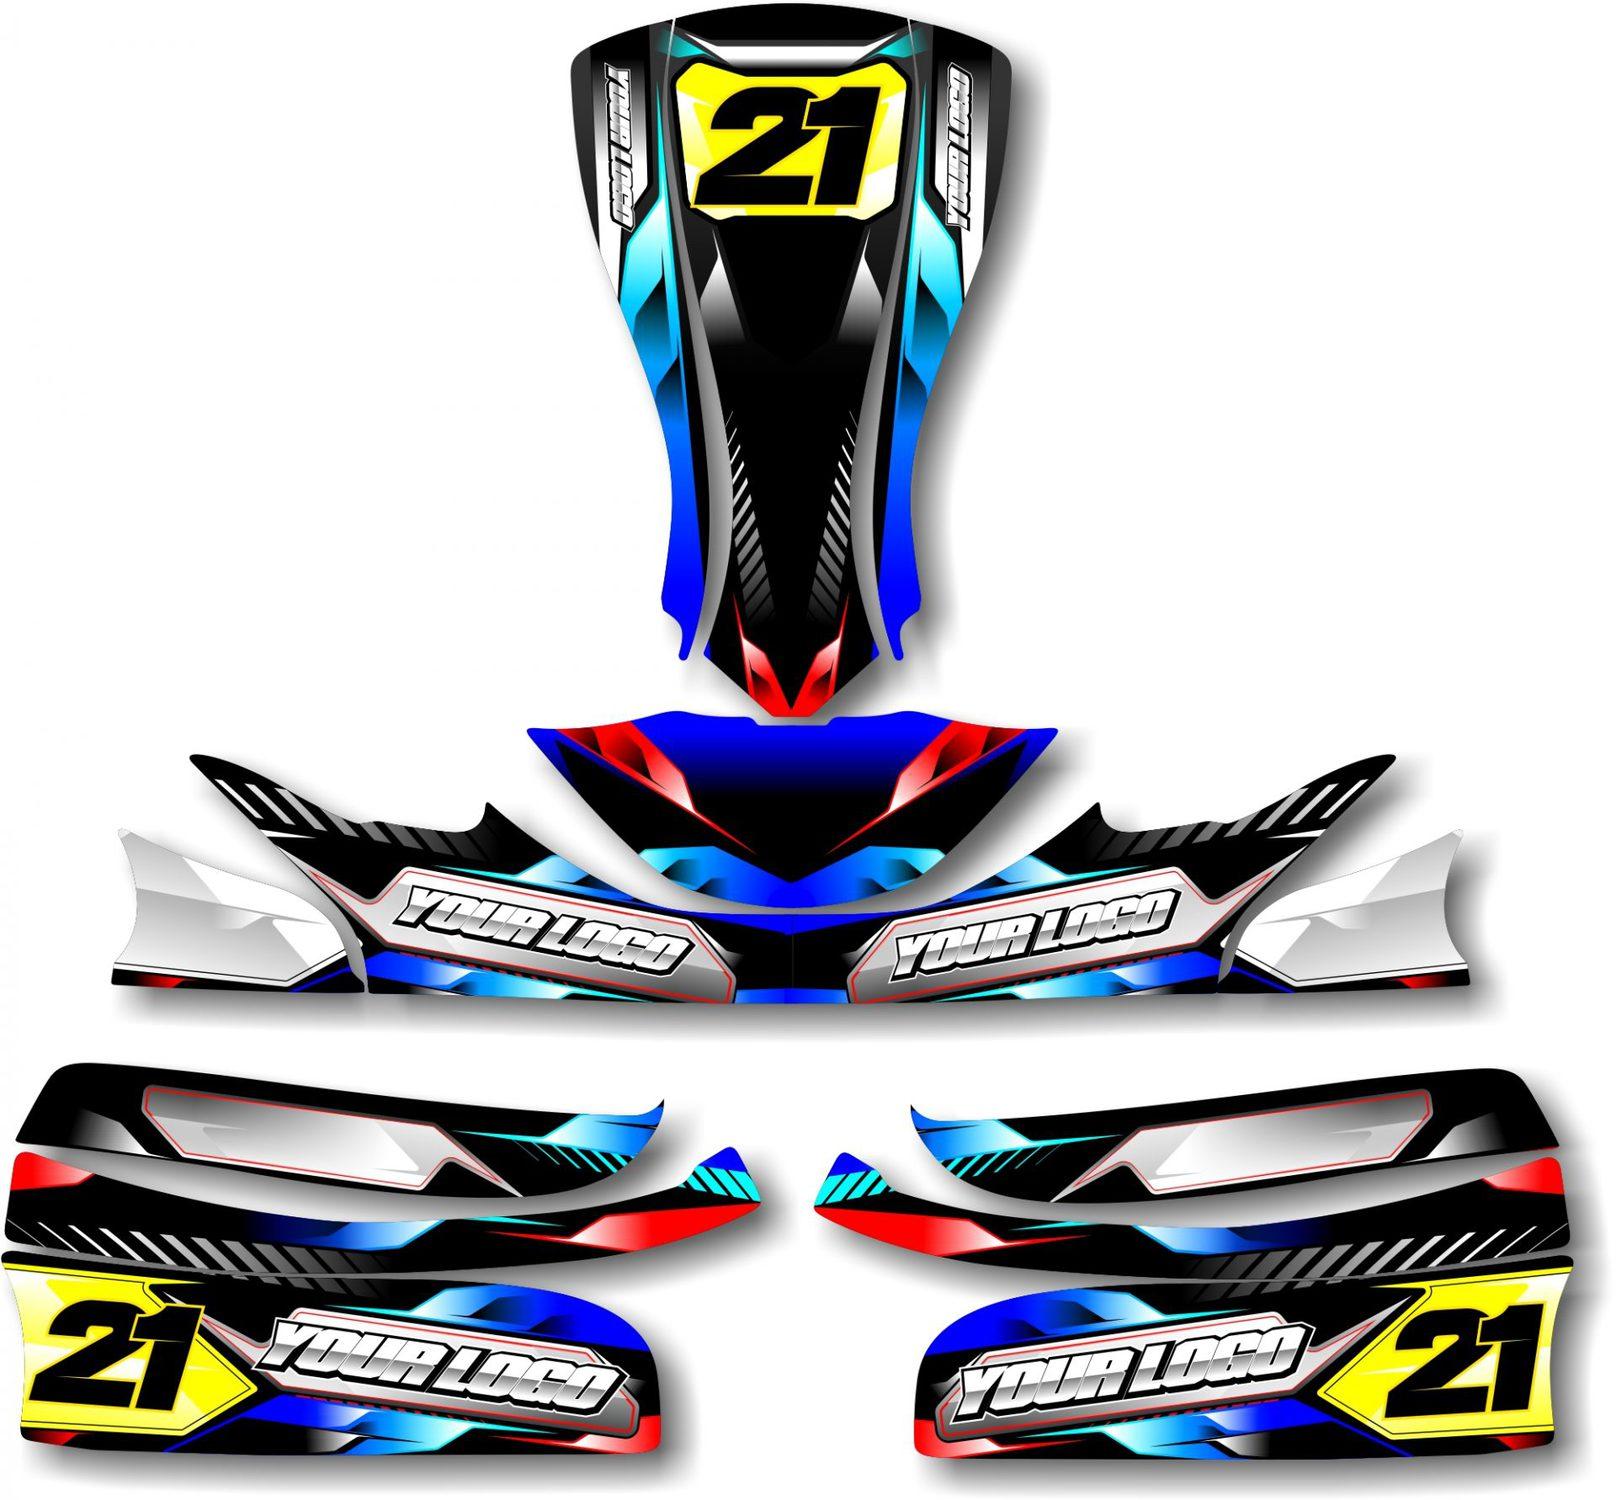 Velocity Kart Kit Blue Rival Ink Design Co